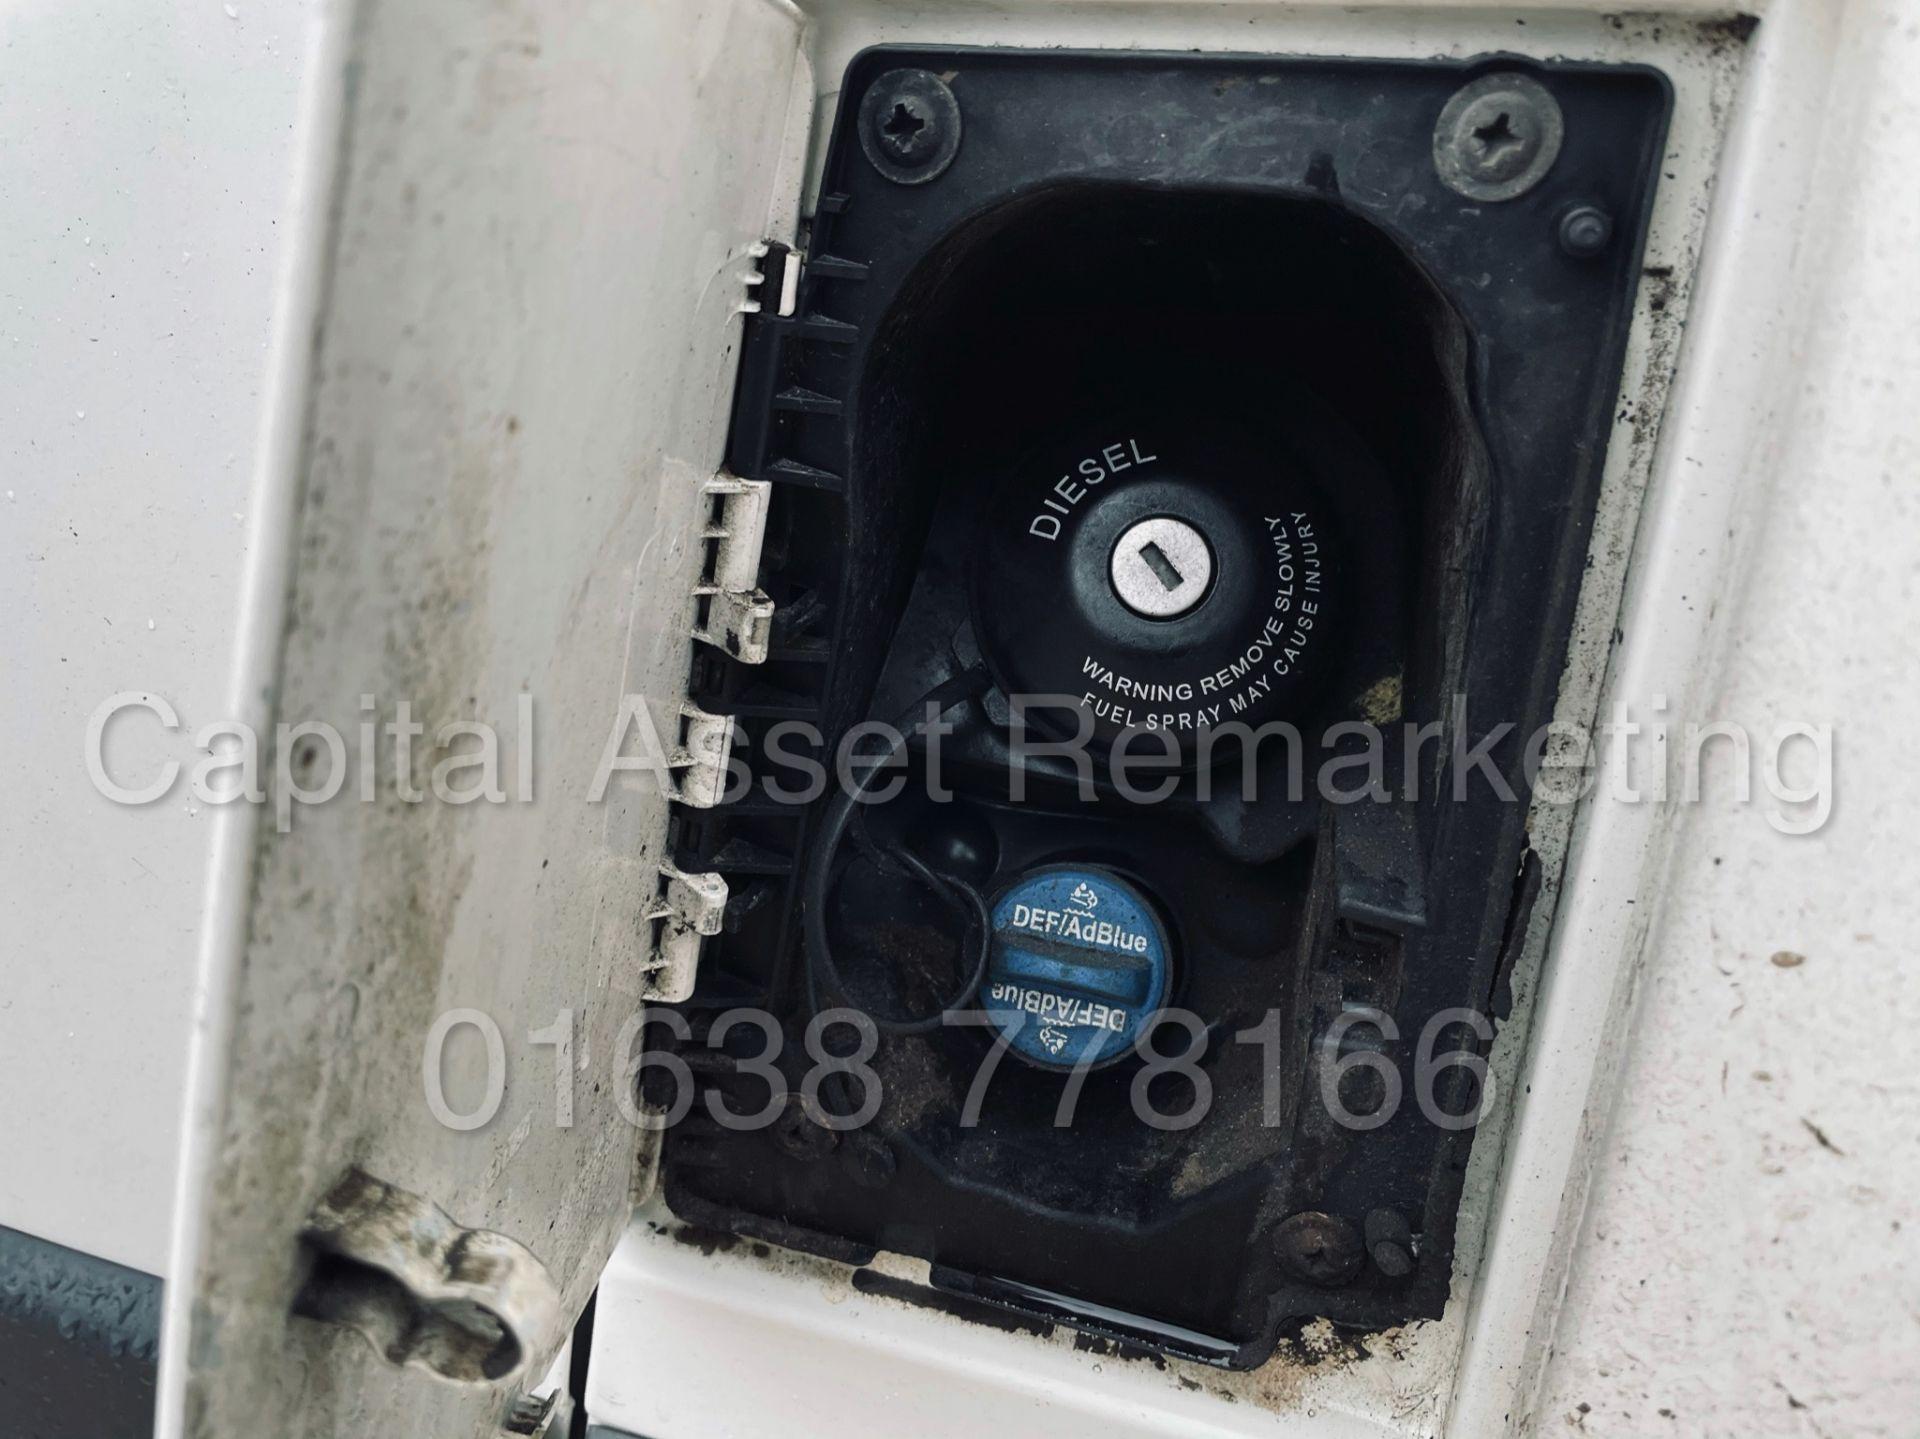 (On Sale) PEUGEOT BOXER *LWB - LO LOADER / LUTON BOX VAN* (67 REG - EURO 6) '2.0 BLUE HDI - 6 SPEED' - Image 16 of 38